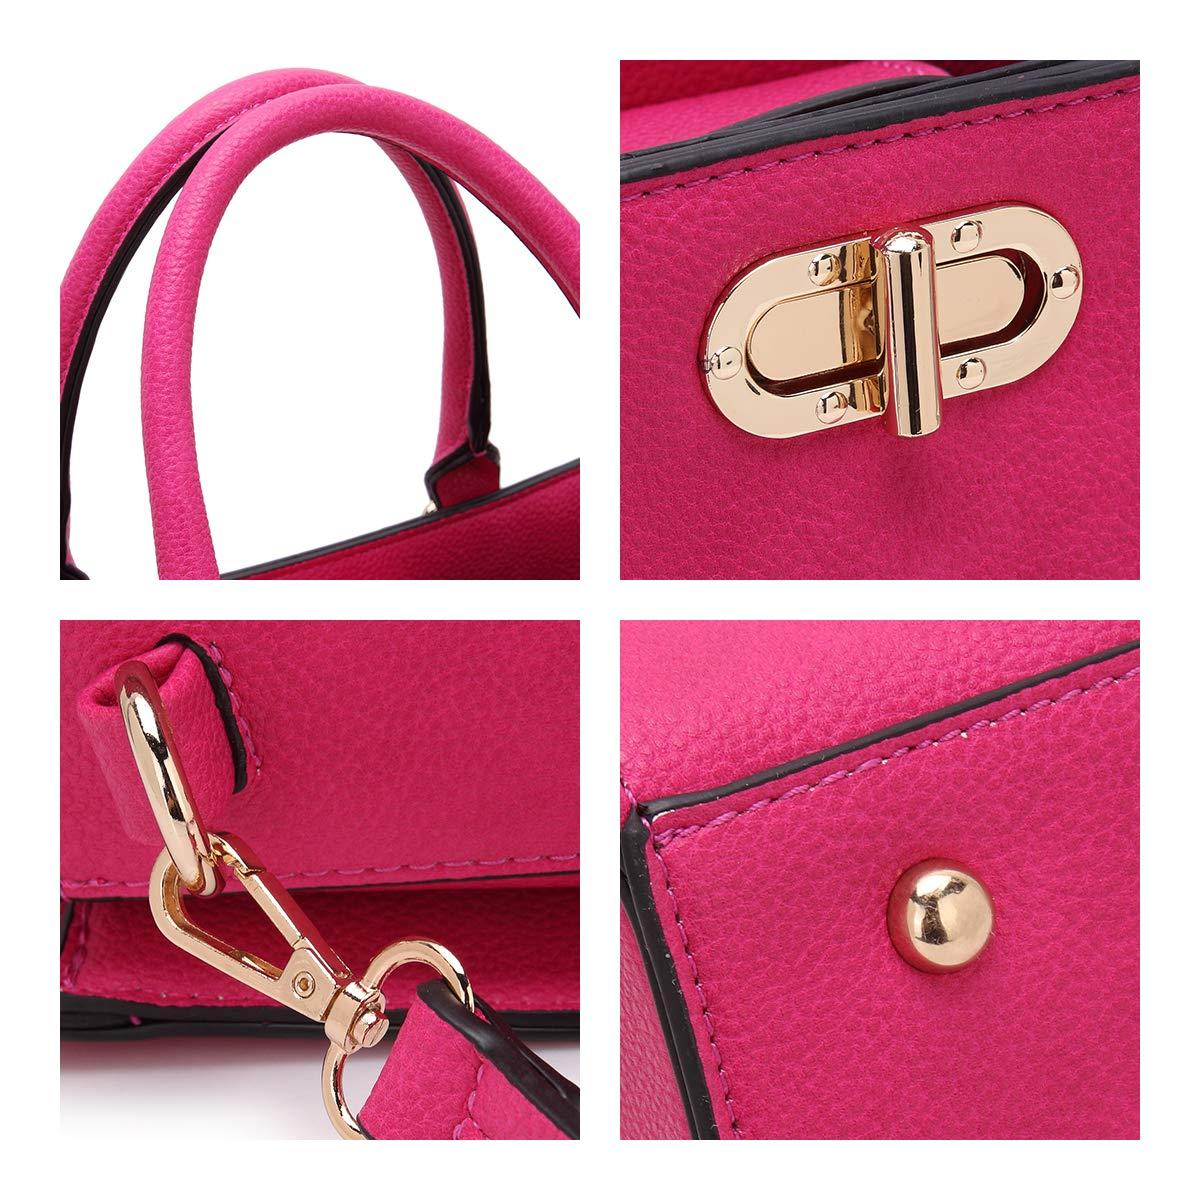 Women's Fashion Handbags Tote Purses Shoulder Bags Top Handle Satchel Purse Set 2pcs 01- Fuchsia by Dasein (Image #4)